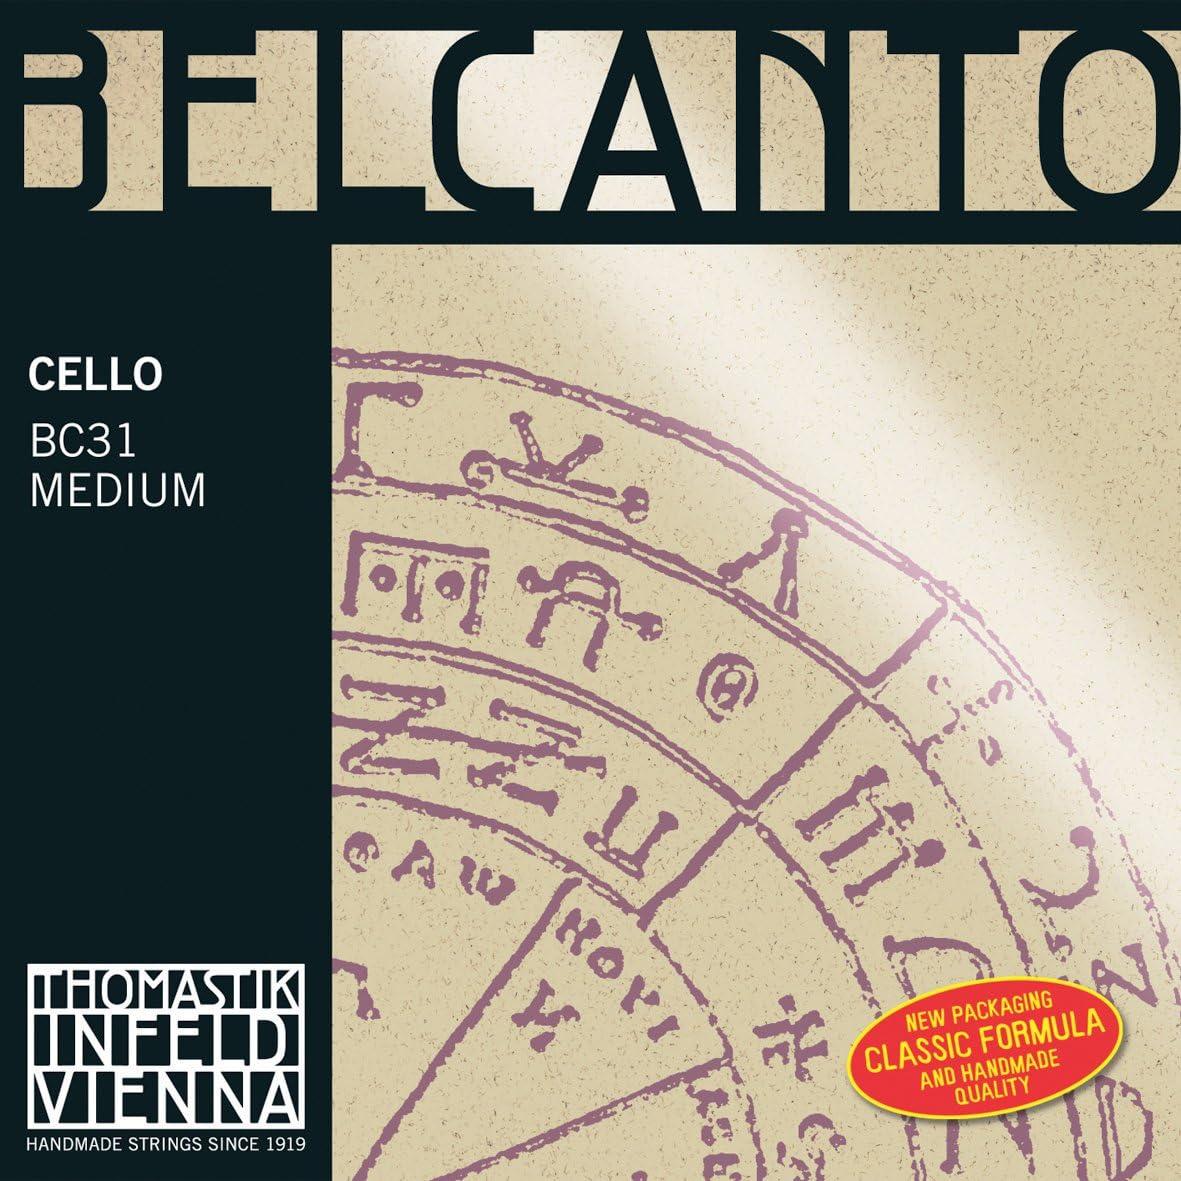 Thomastik-Infeld Sales for sale Cello BC31 Ranking TOP9 Strings